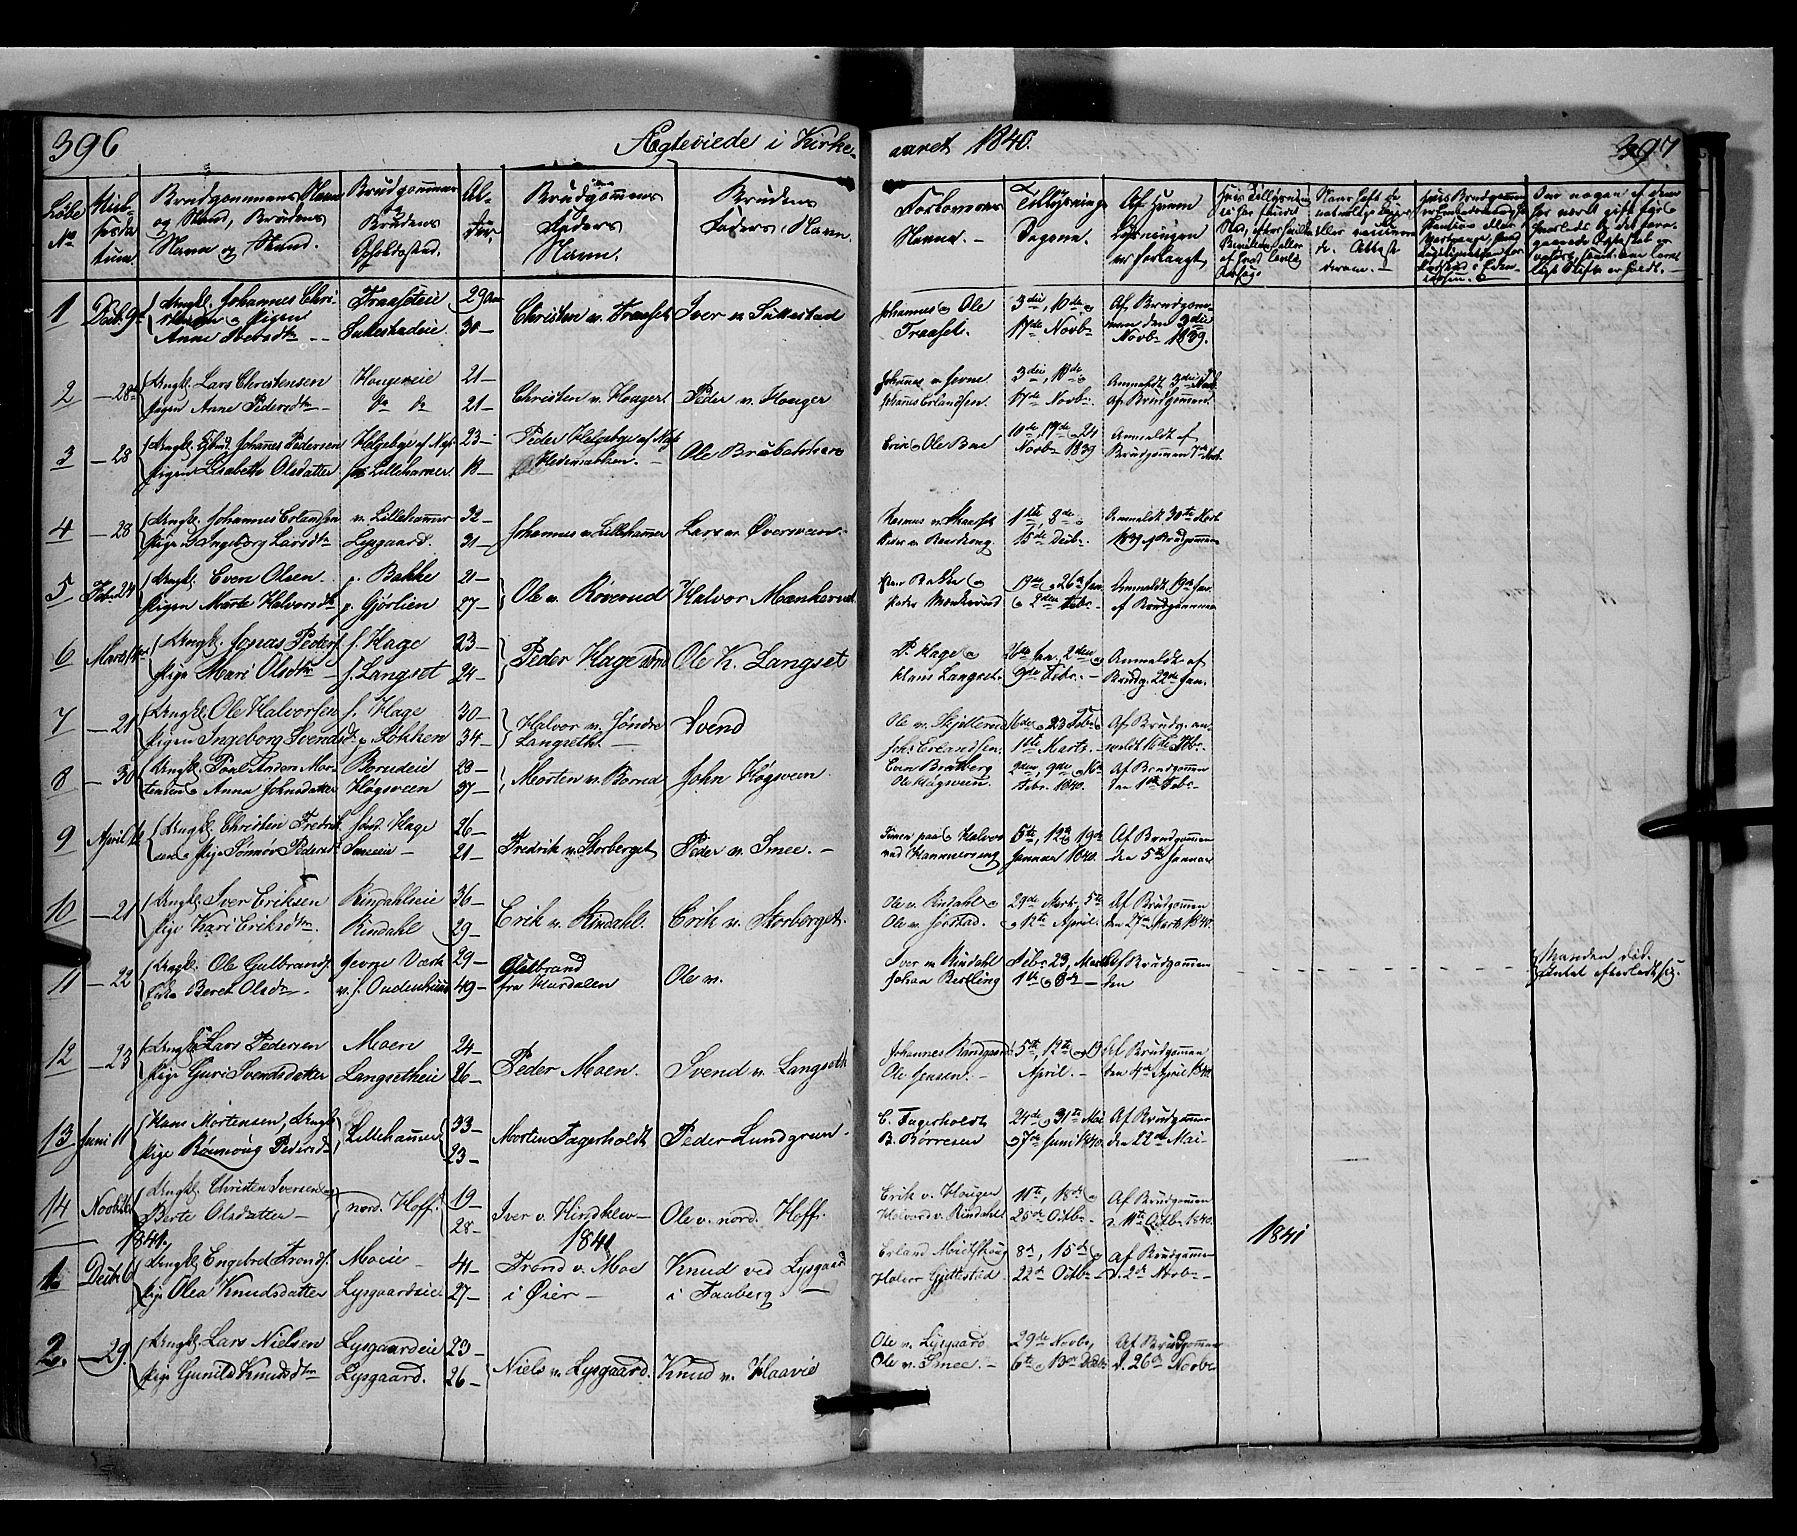 SAH, Fåberg prestekontor, Klokkerbok nr. 6, 1837-1855, s. 396-397